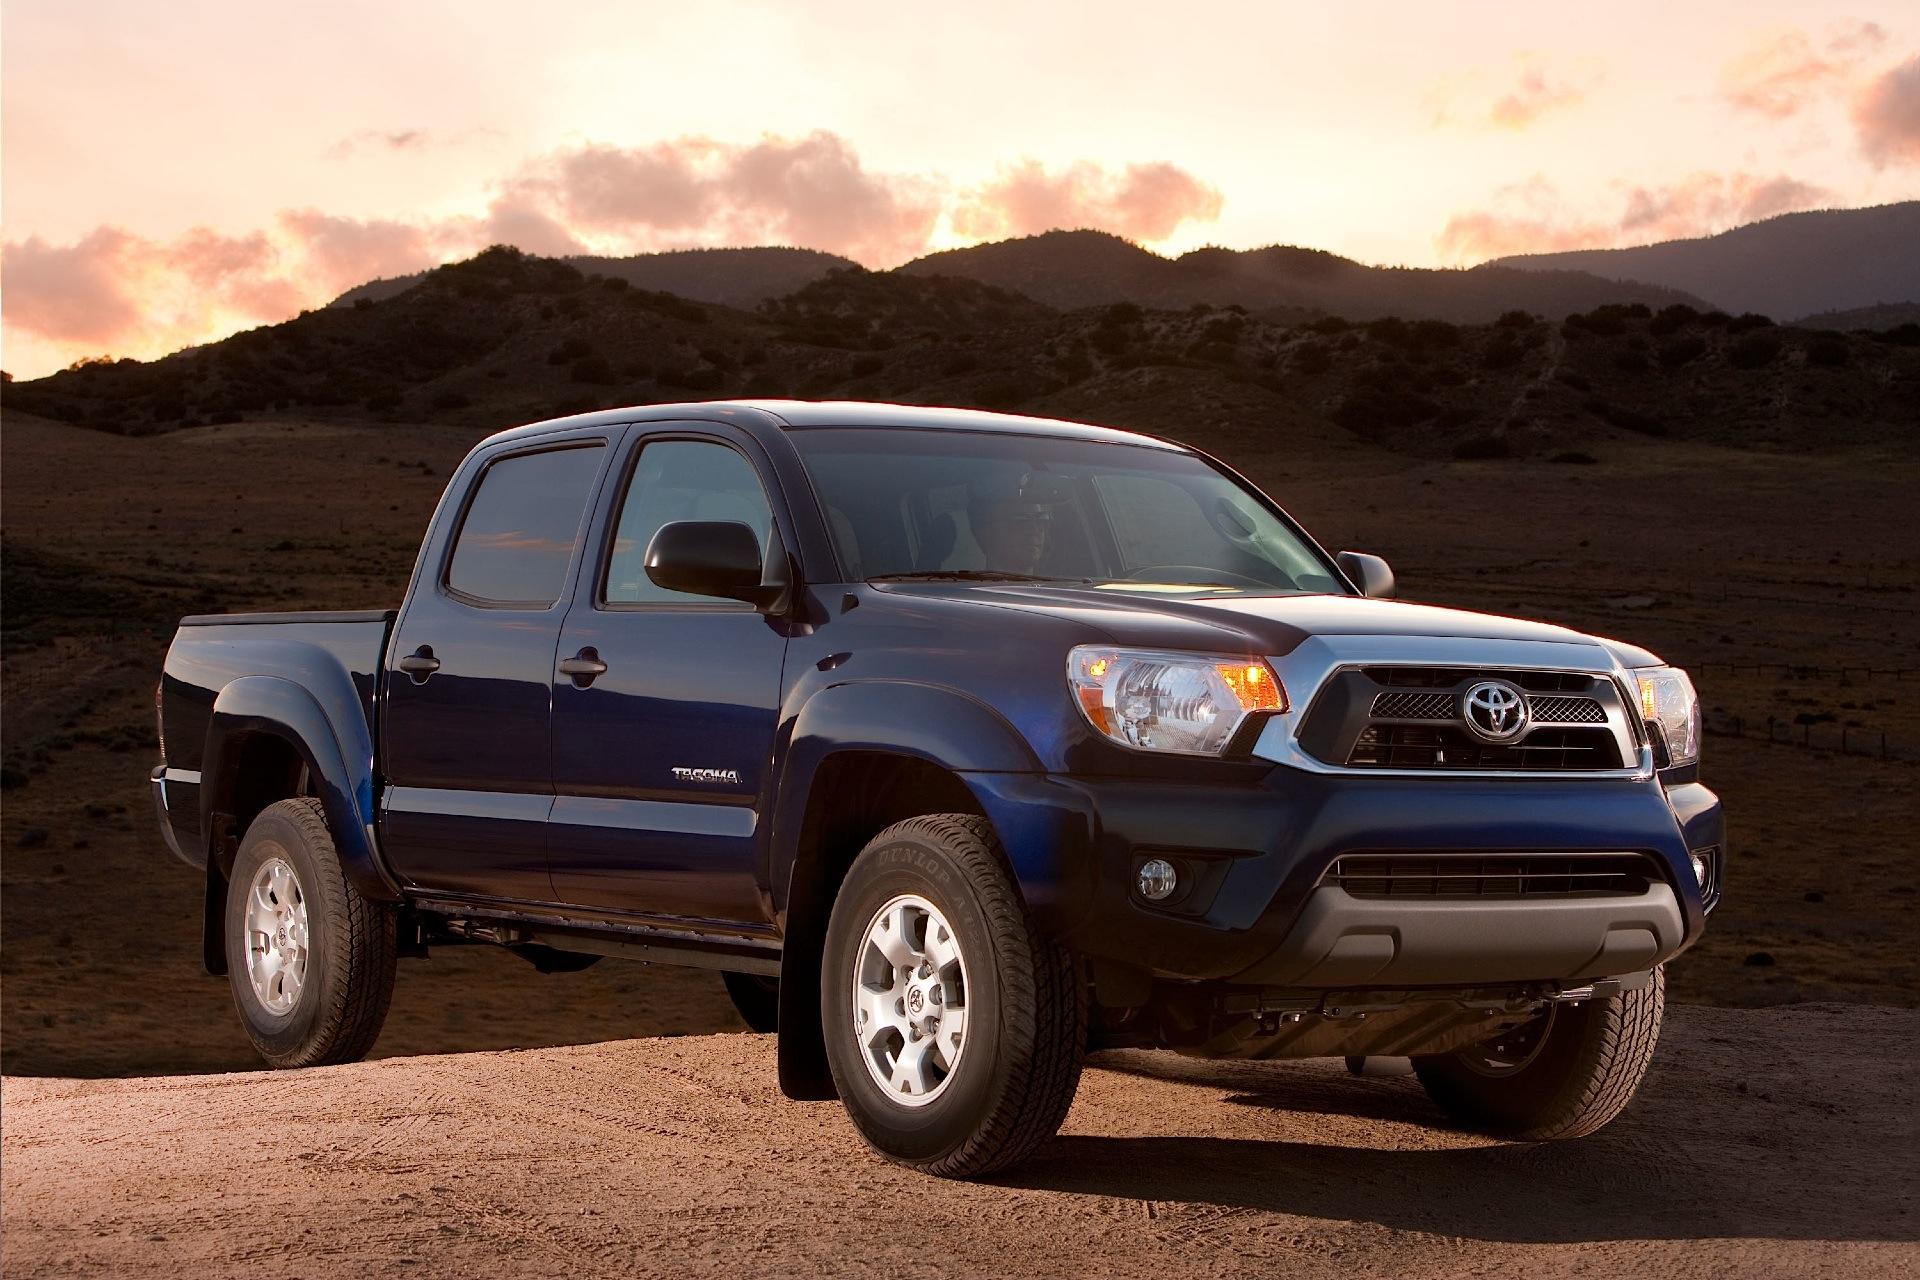 Toyota Tacoma Evolution >> TOYOTA Tacoma specs - 2005, 2006, 2007, 2008, 2009, 2010, 2011 - autoevolution